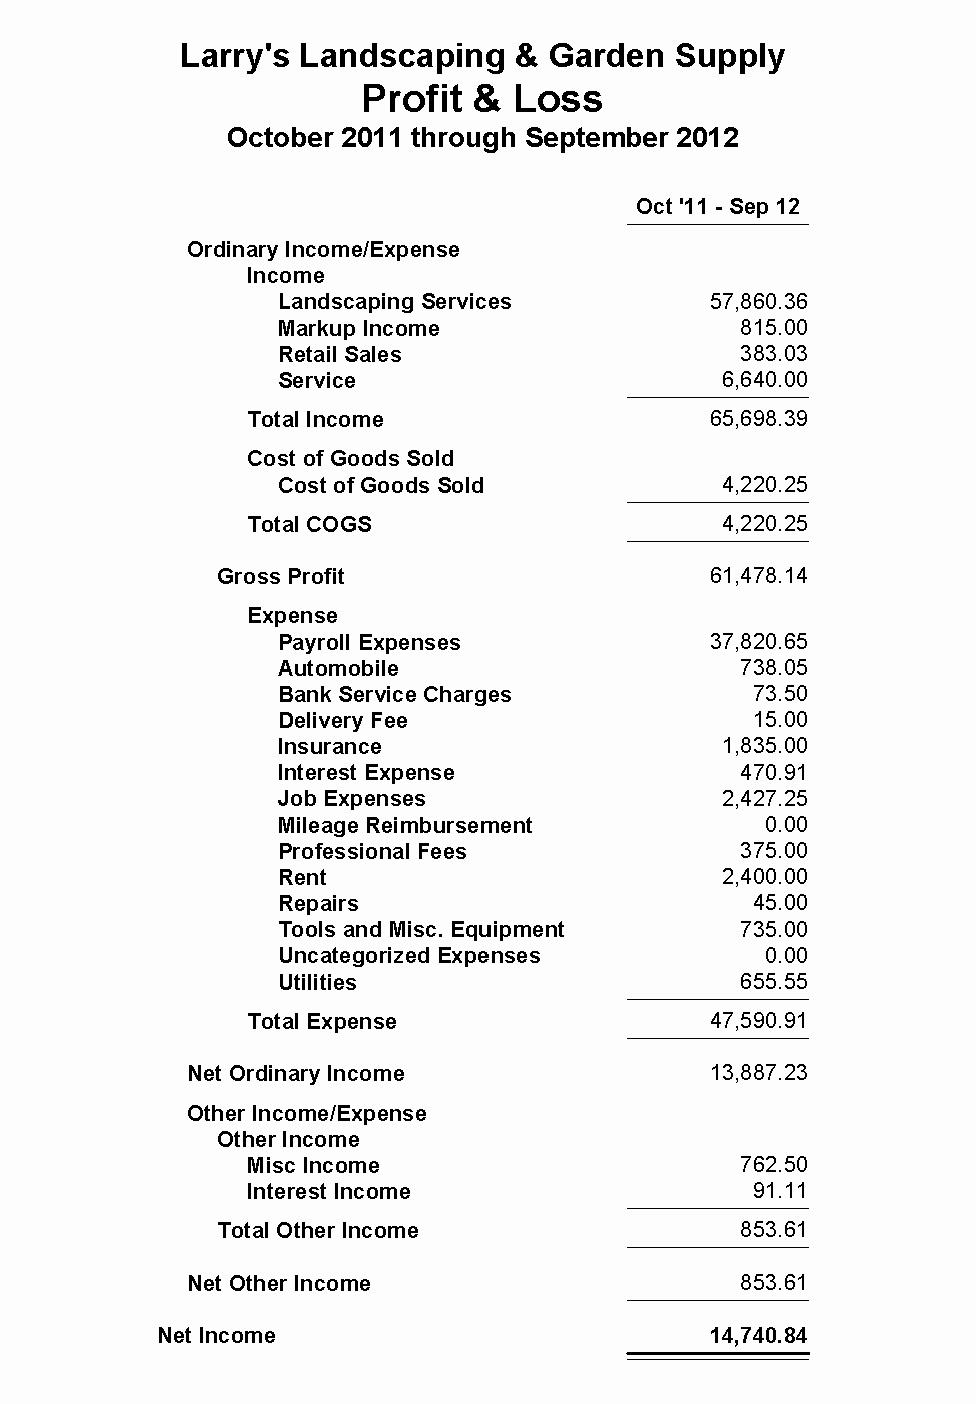 Simple Profit and Loss Statements Elegant American River Bank Profit and Loss Statement